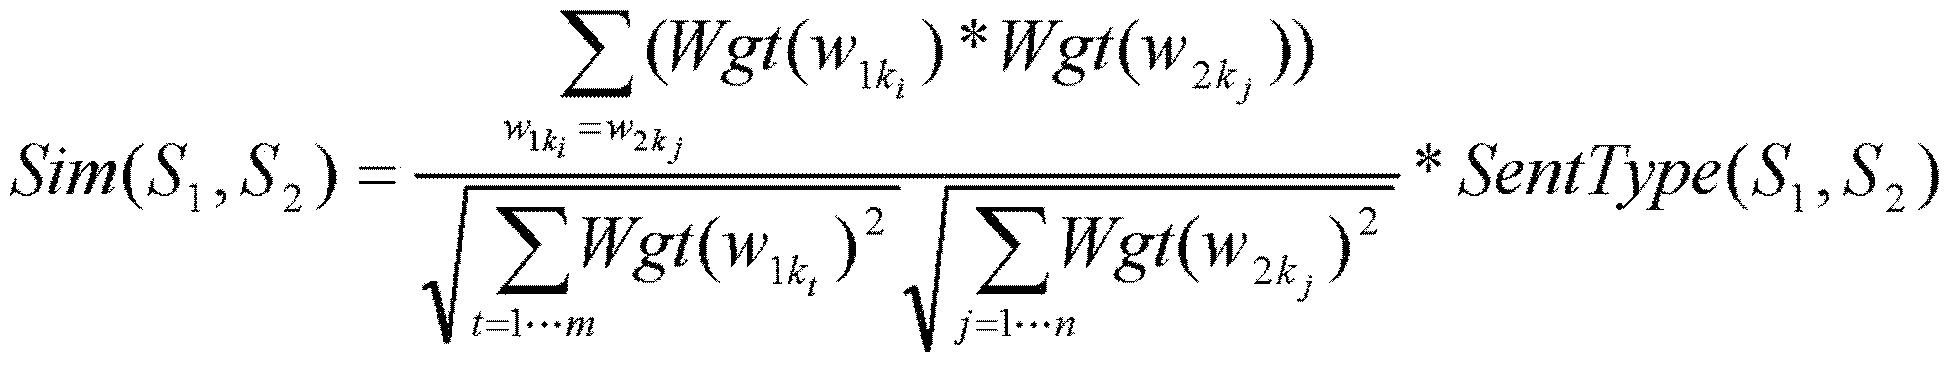 Figure 112015117063705-pat00038